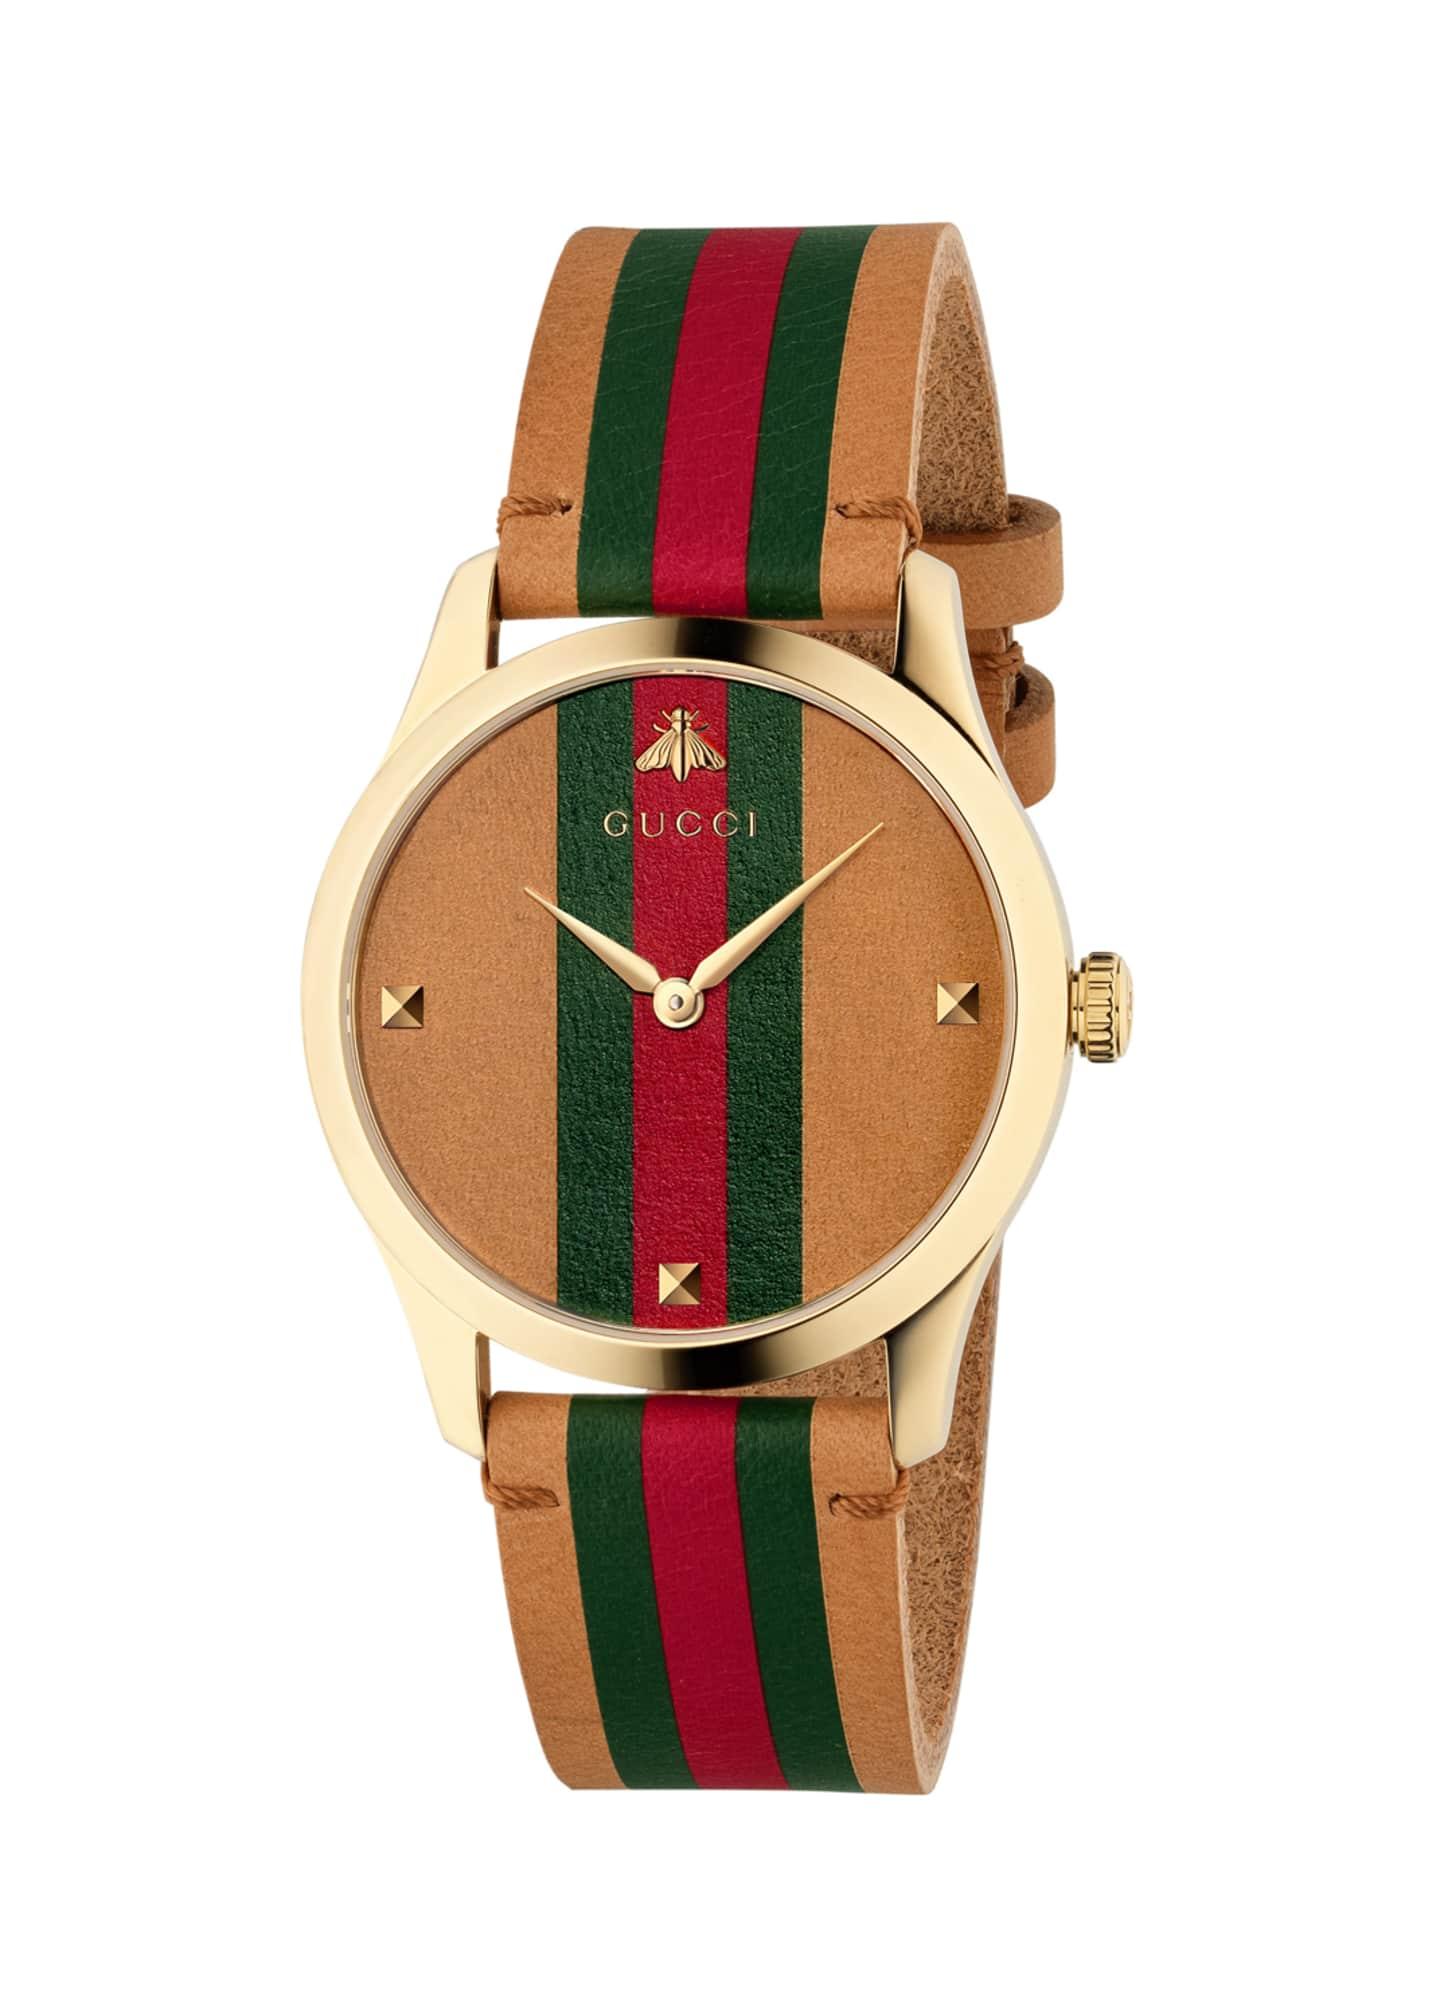 Gucci Men's Tricolor Leather Web Watch